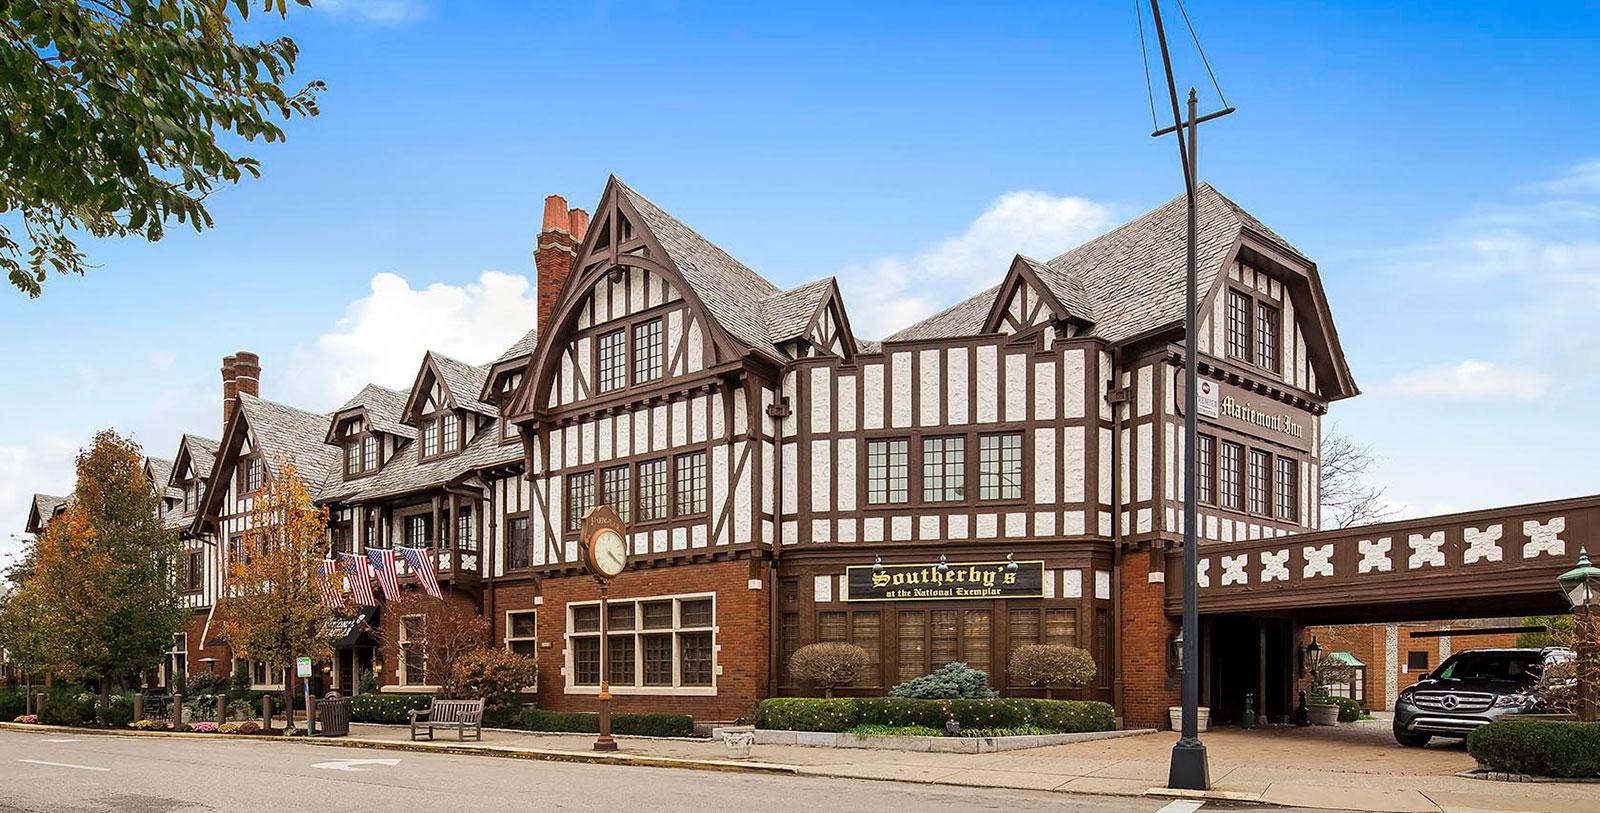 Image of Hotel Exterior at Best Western Mariemont Inn, 1926, Member of Historic Hotels of America, in Cincinnati, Ohio, Overview